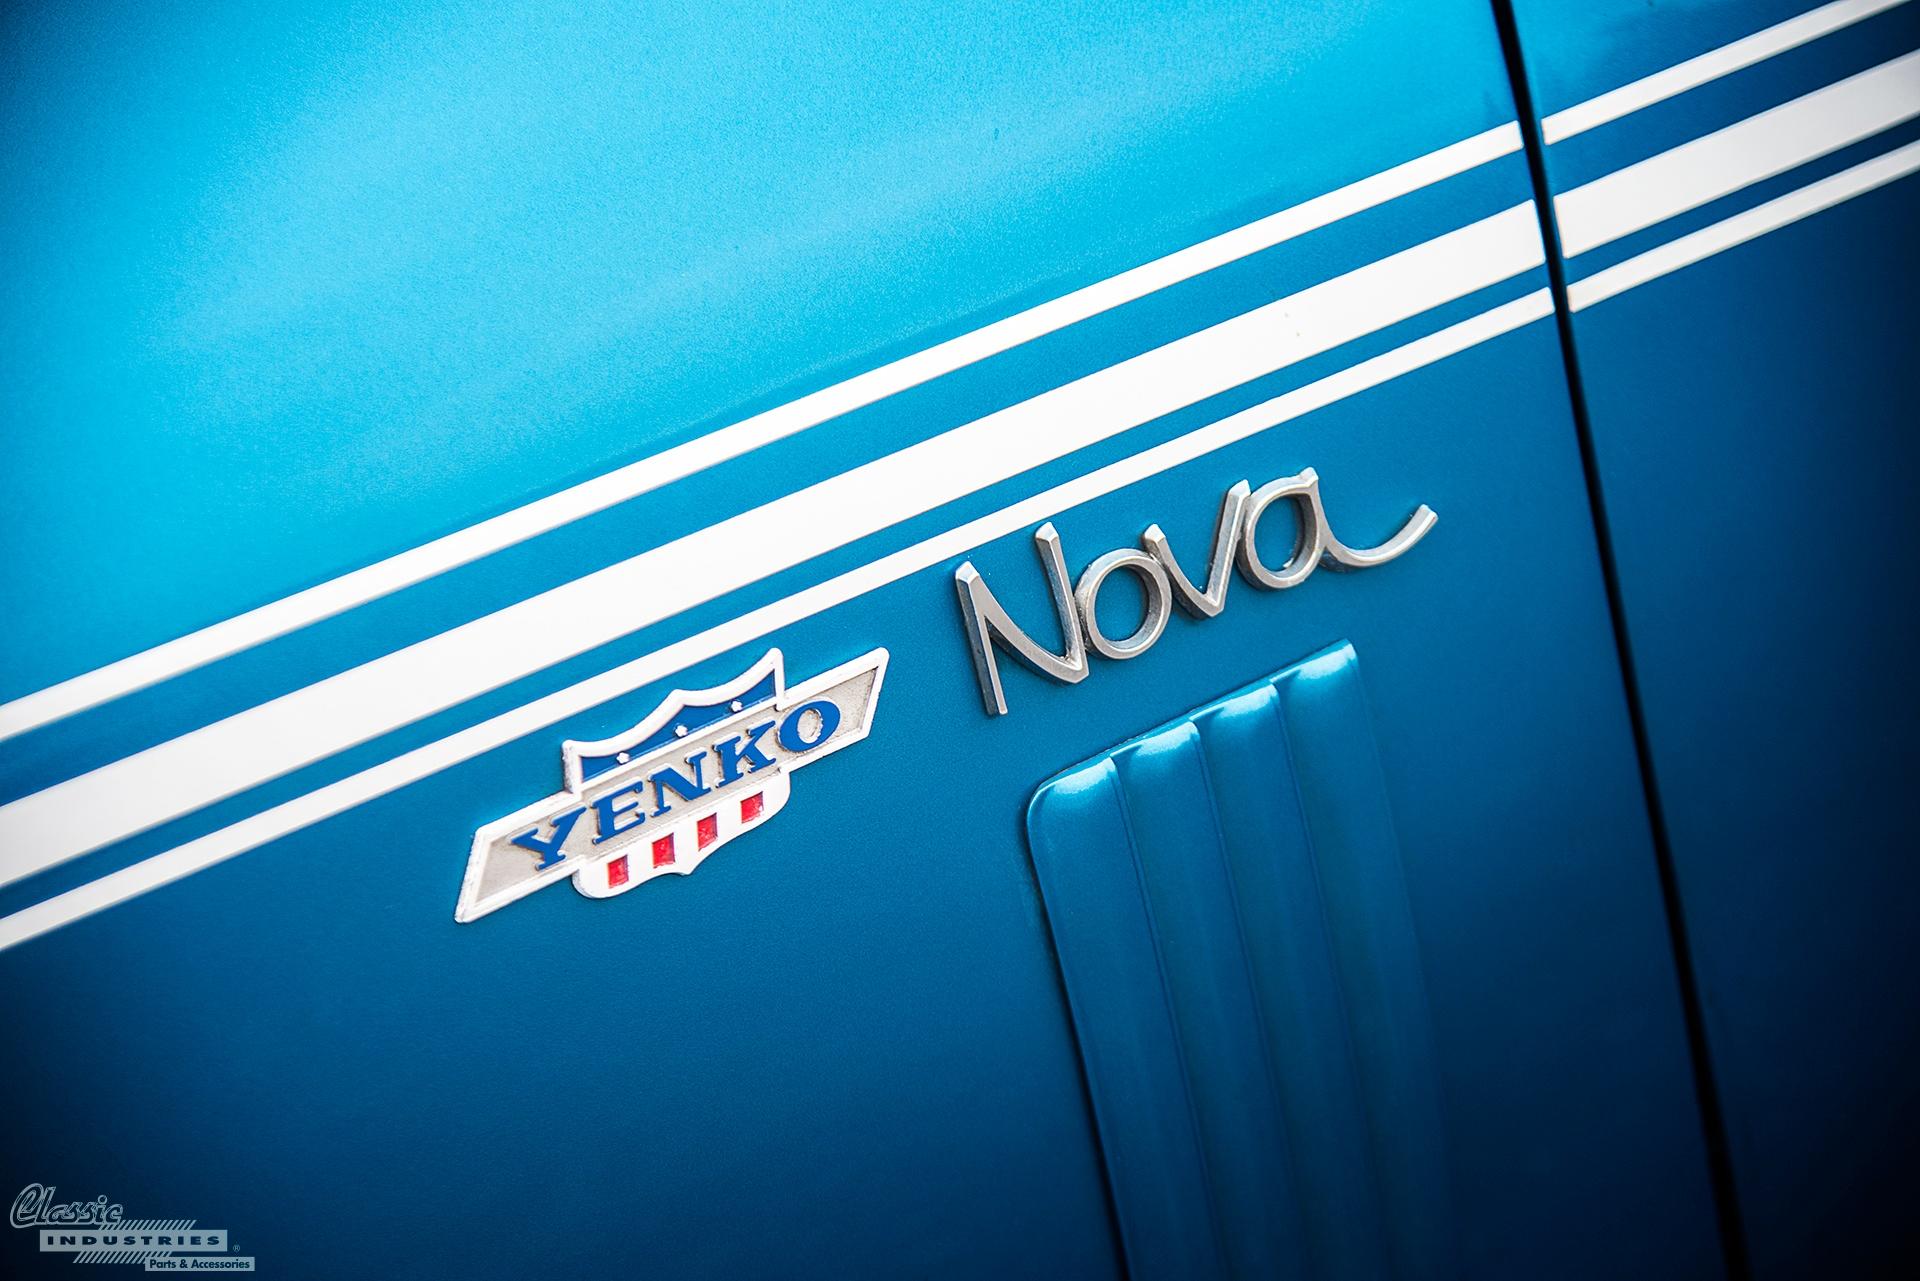 70 Nova Yenko tribute 6.jpg